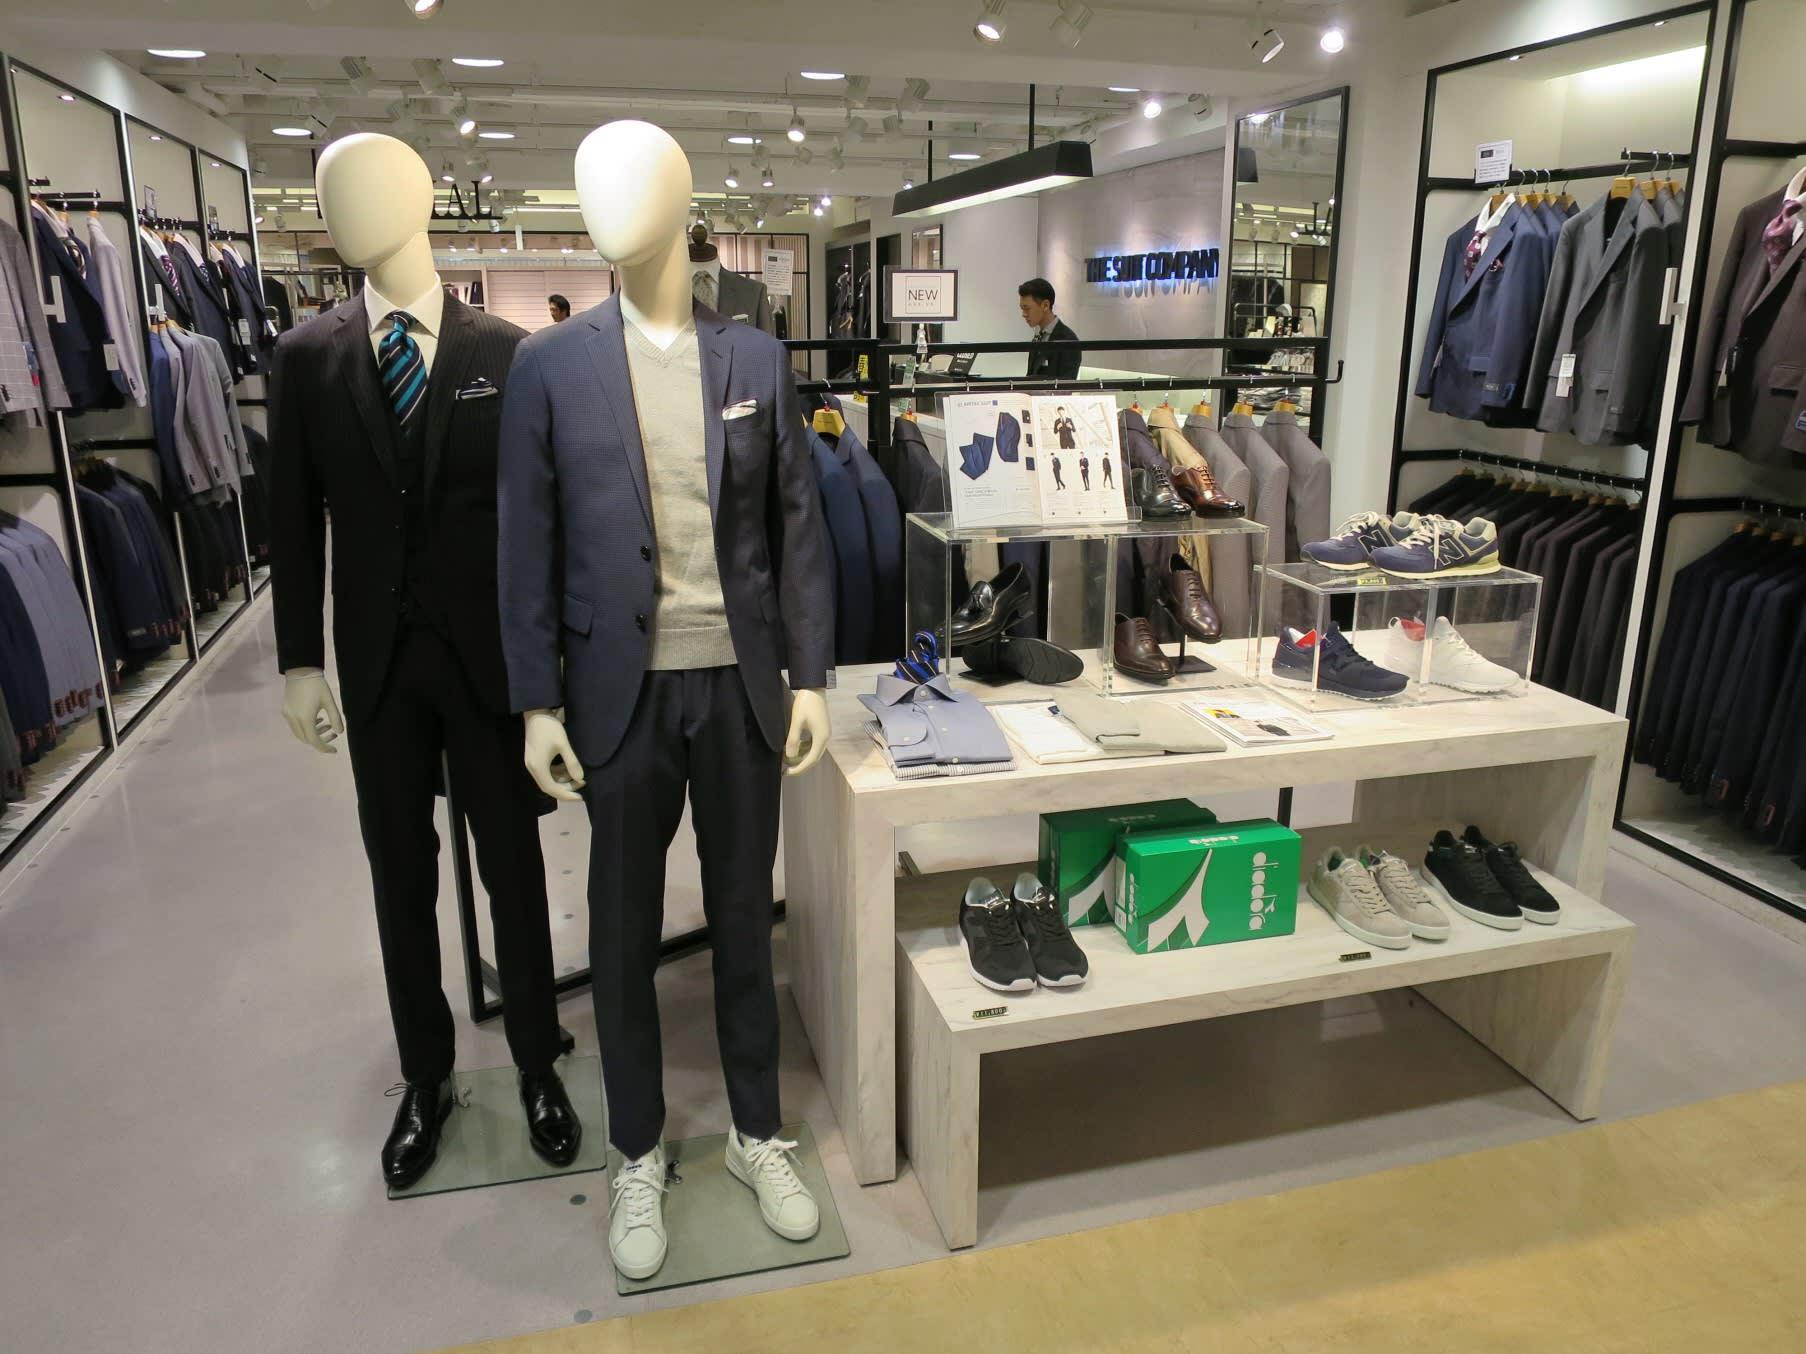 Menswear and shoe stores in Japan put salarymen in sneakers